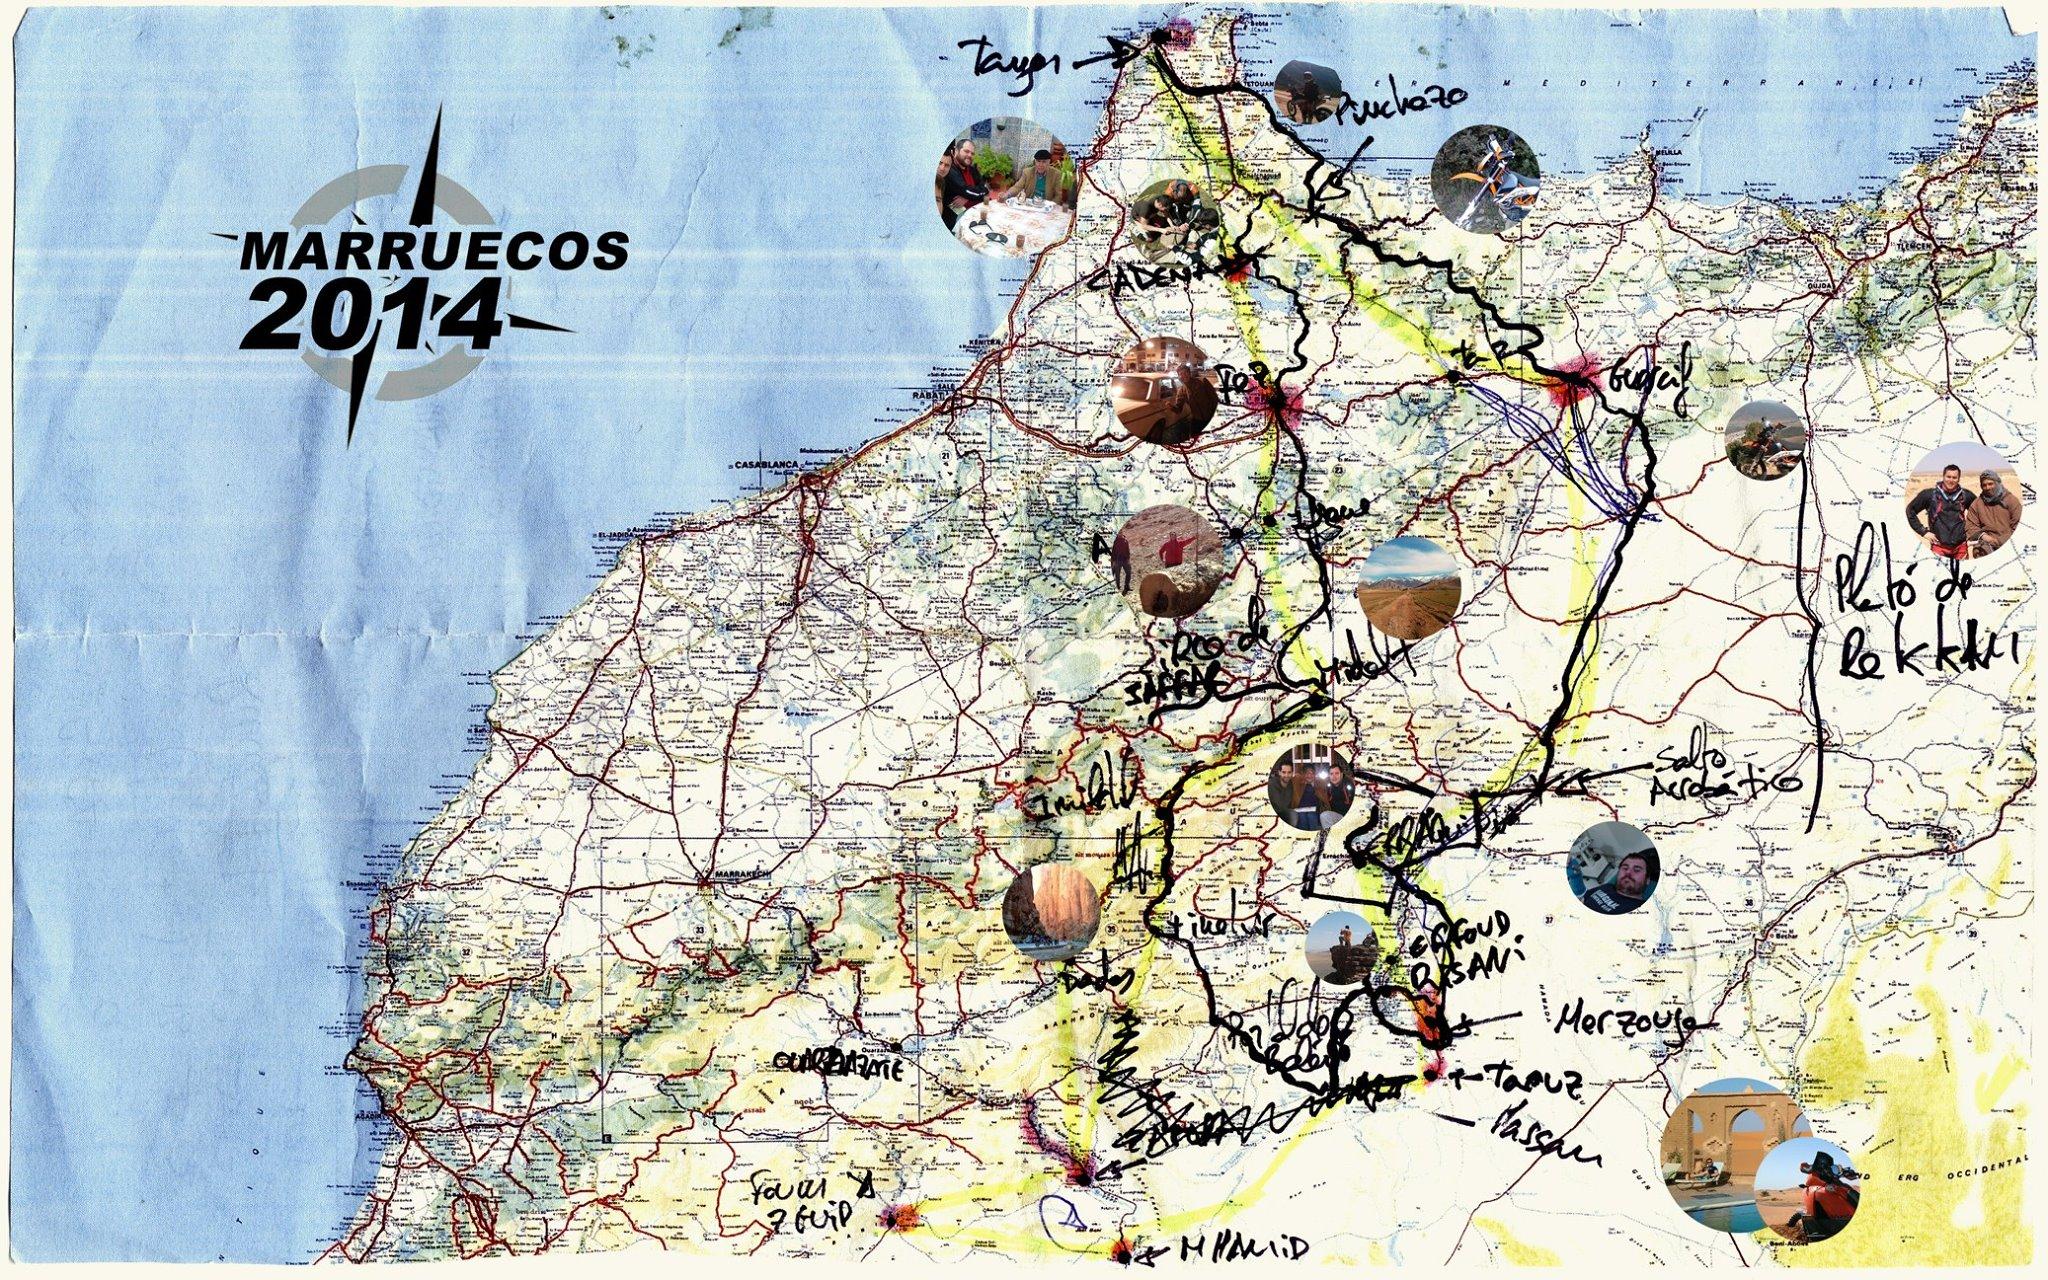 marruecos 2014